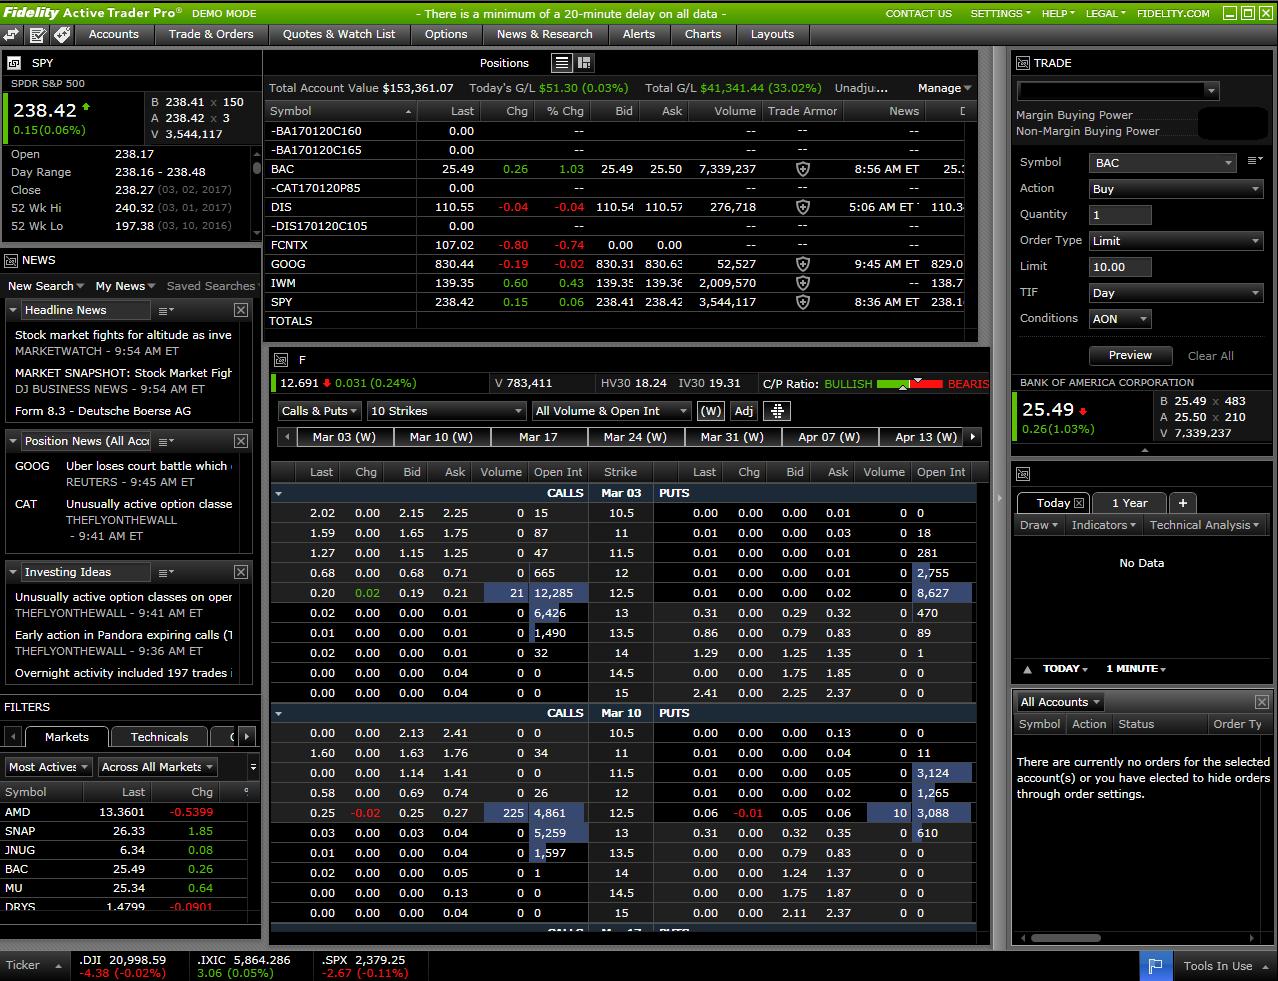 Fidelity active trader pro demo